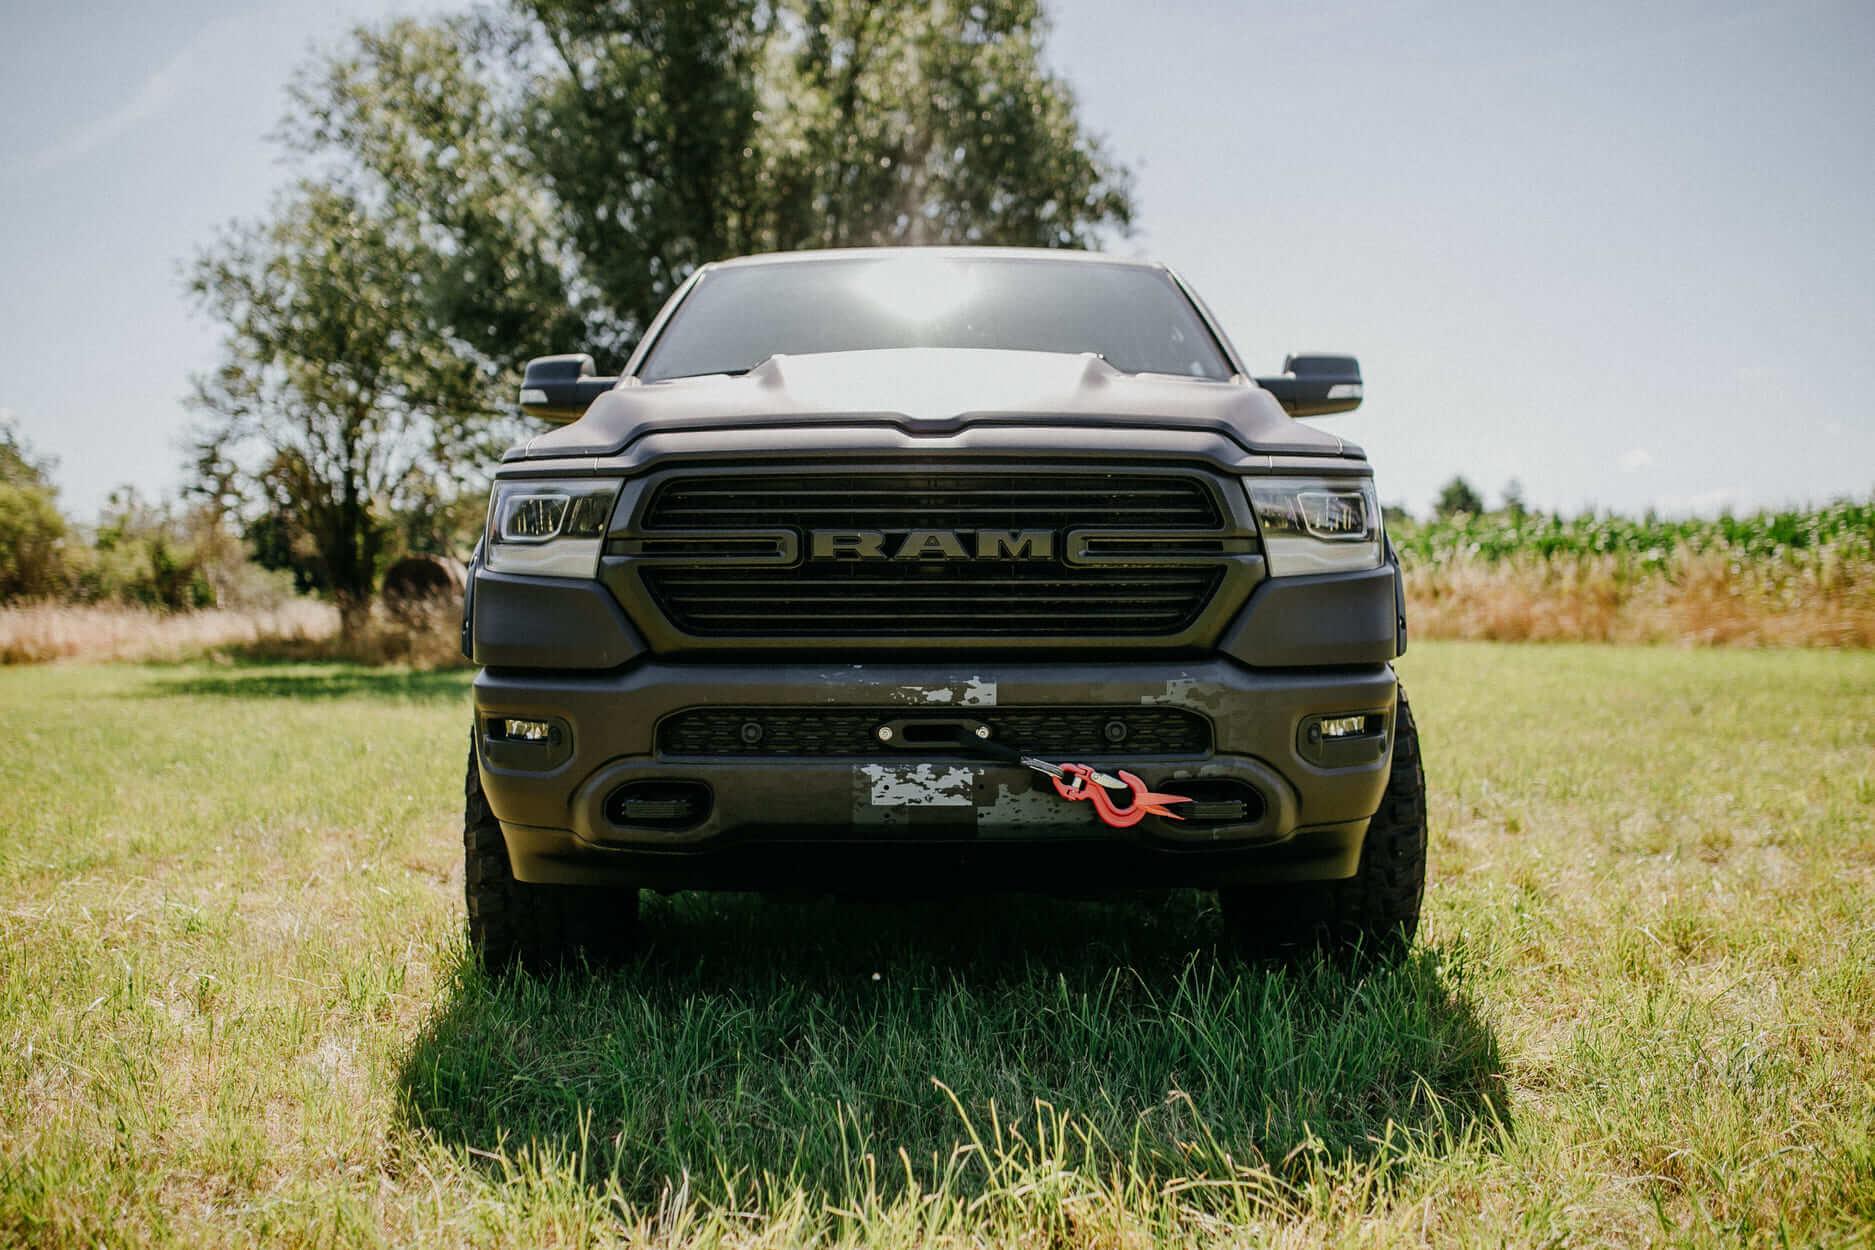 RAM Laramie RAM-BO 1